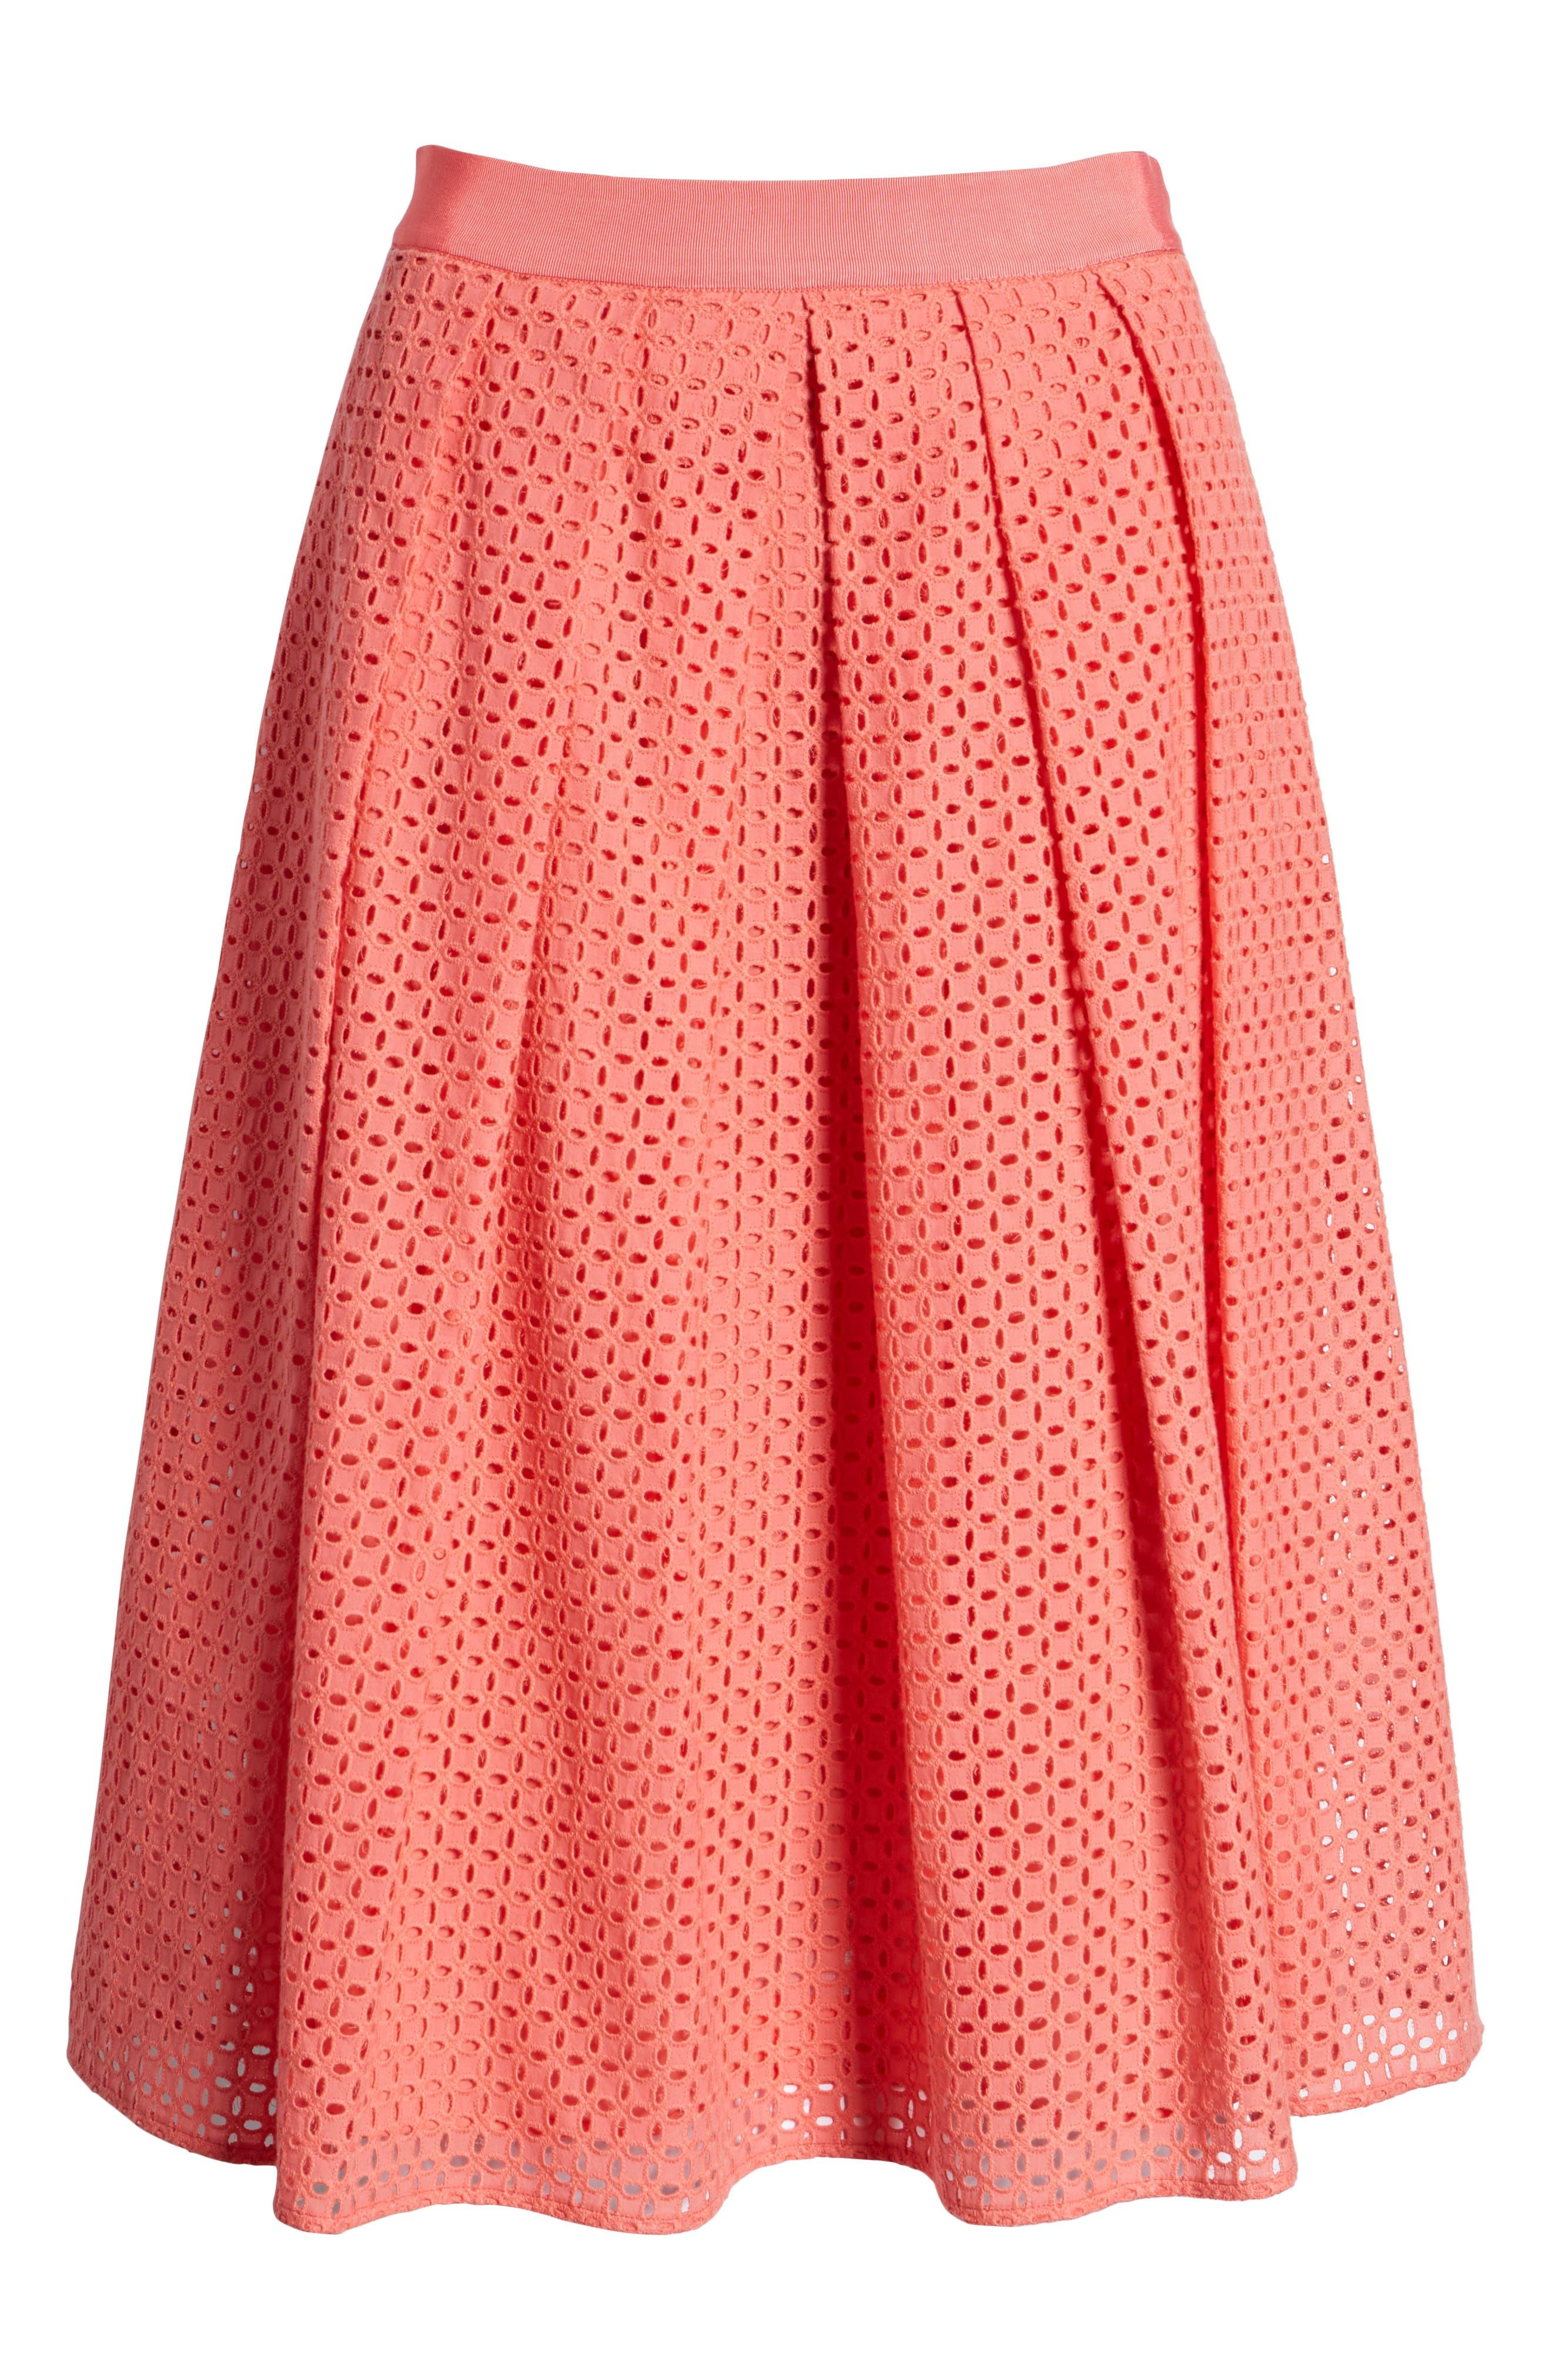 Eyelet A-Line Skirt,                             Alternate thumbnail 6, color,                             Coral Sugar